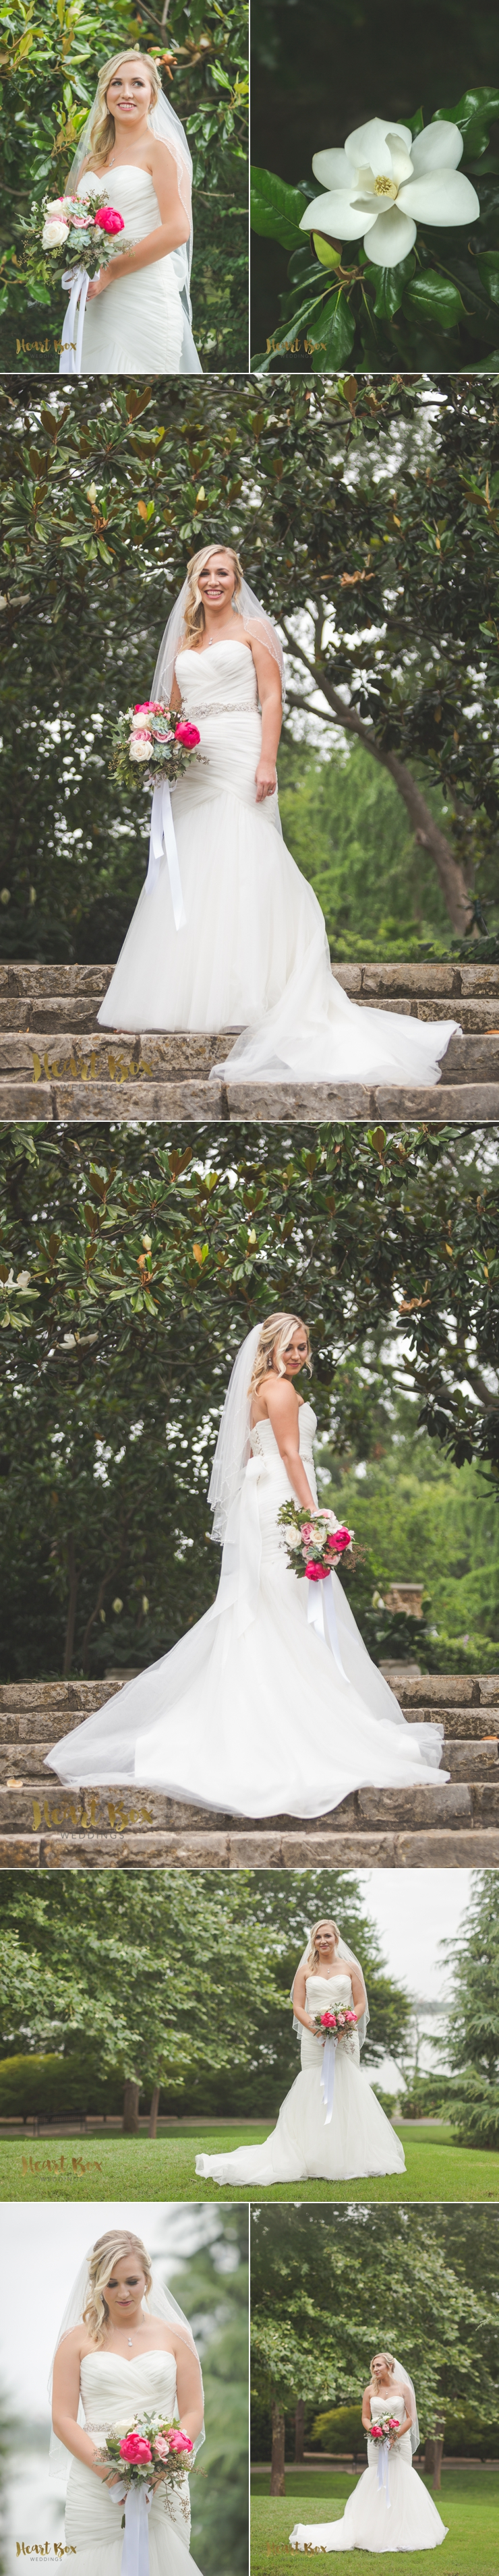 Karlee Bridal Blog Collages 4.jpg